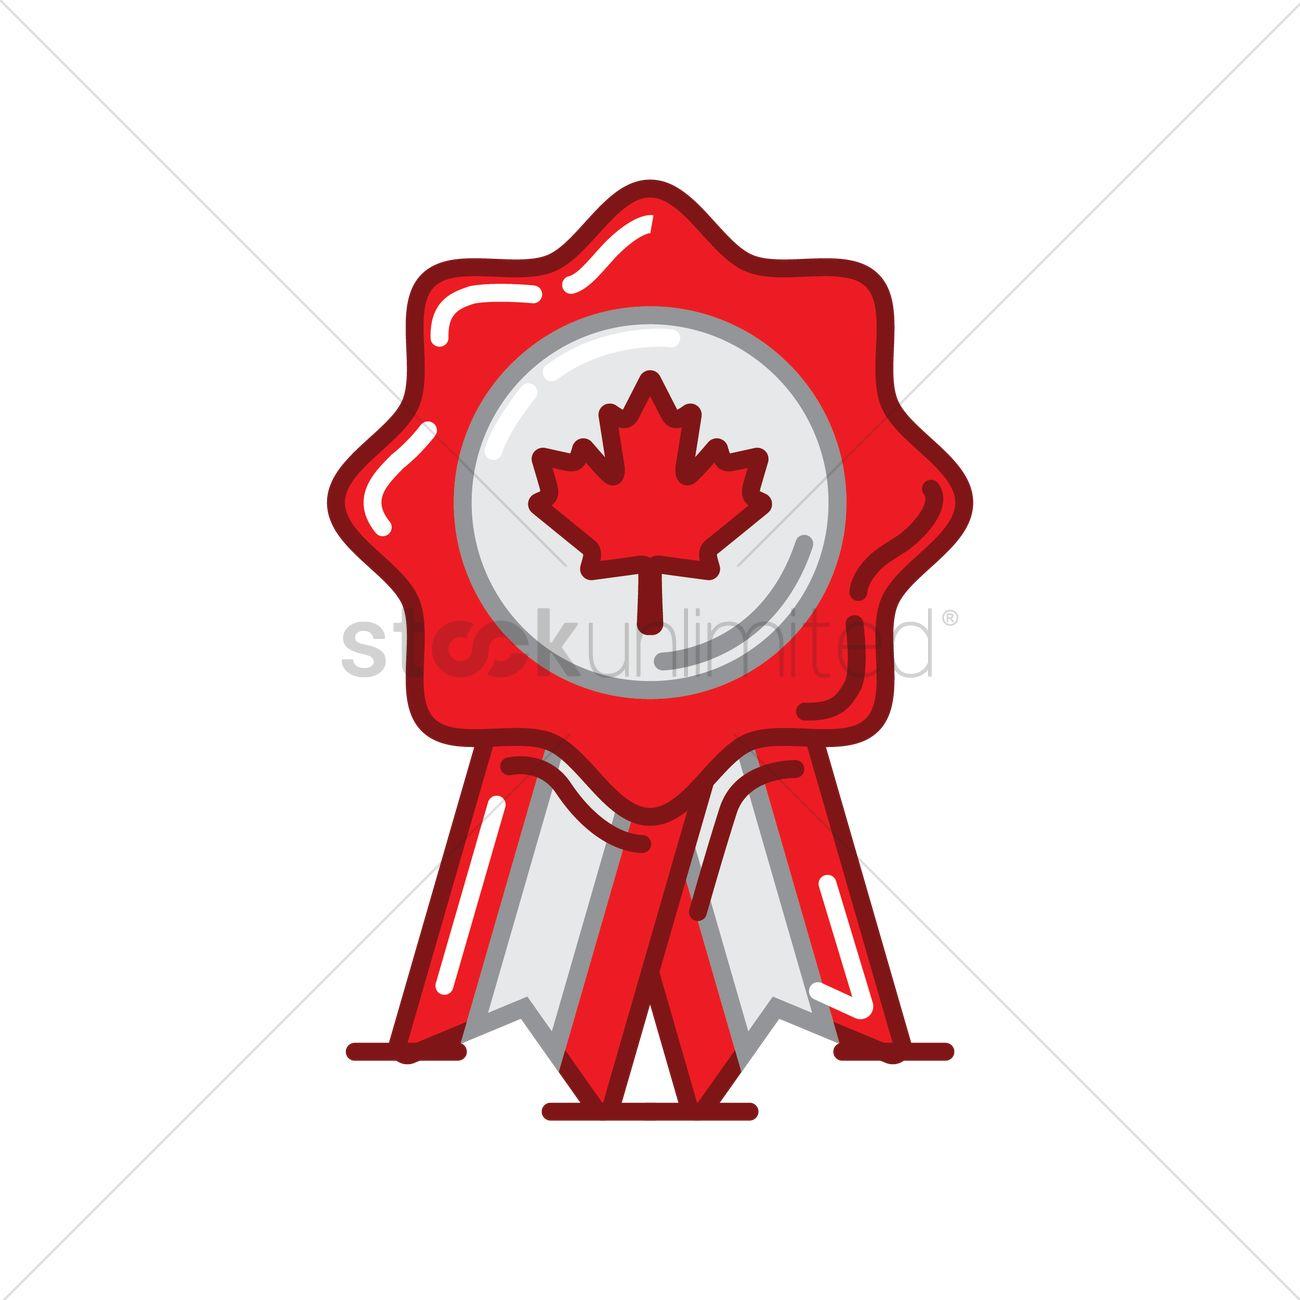 Badge ribbon Vector Image - 1962971 | StockUnlimited